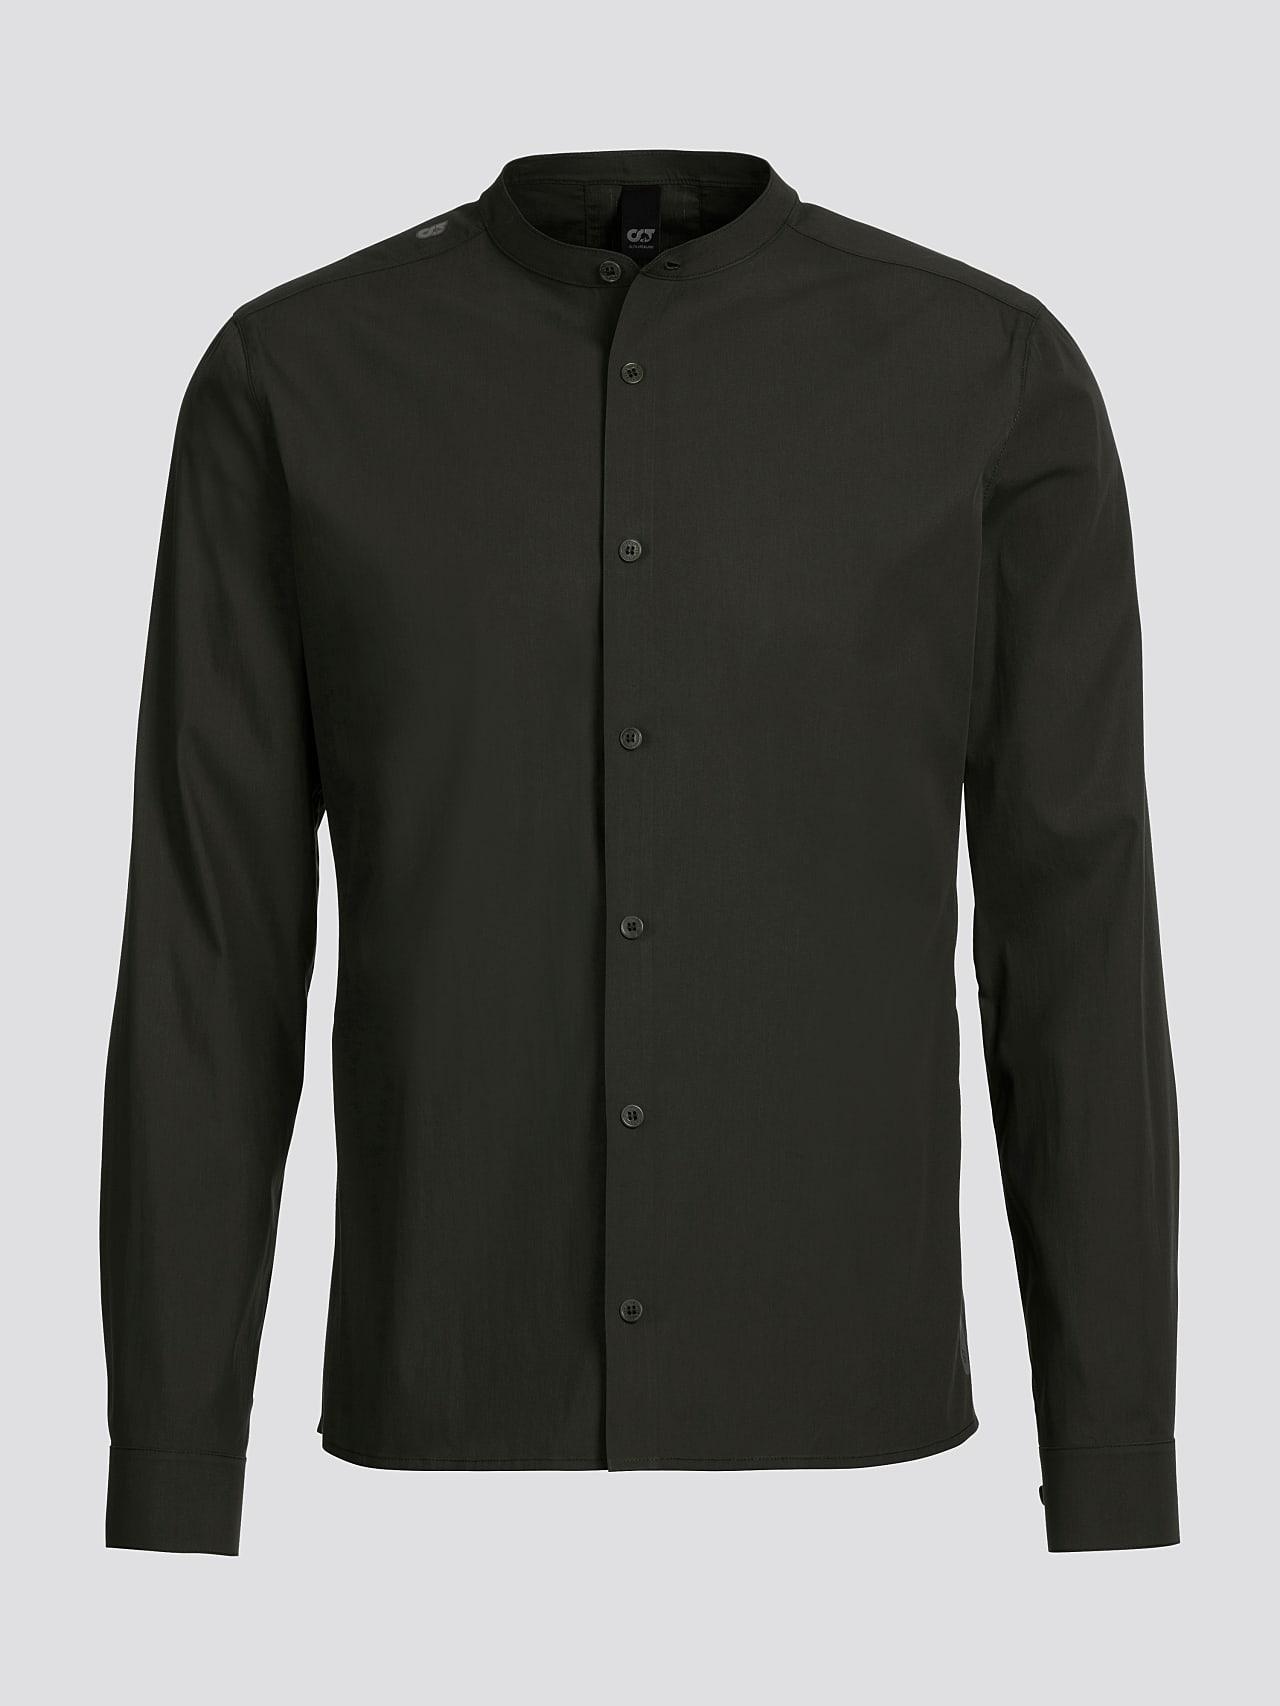 WIDT V9.Y5.01 Stand-Up Collar Cotton-Stretch Shirt olive Back Alpha Tauri